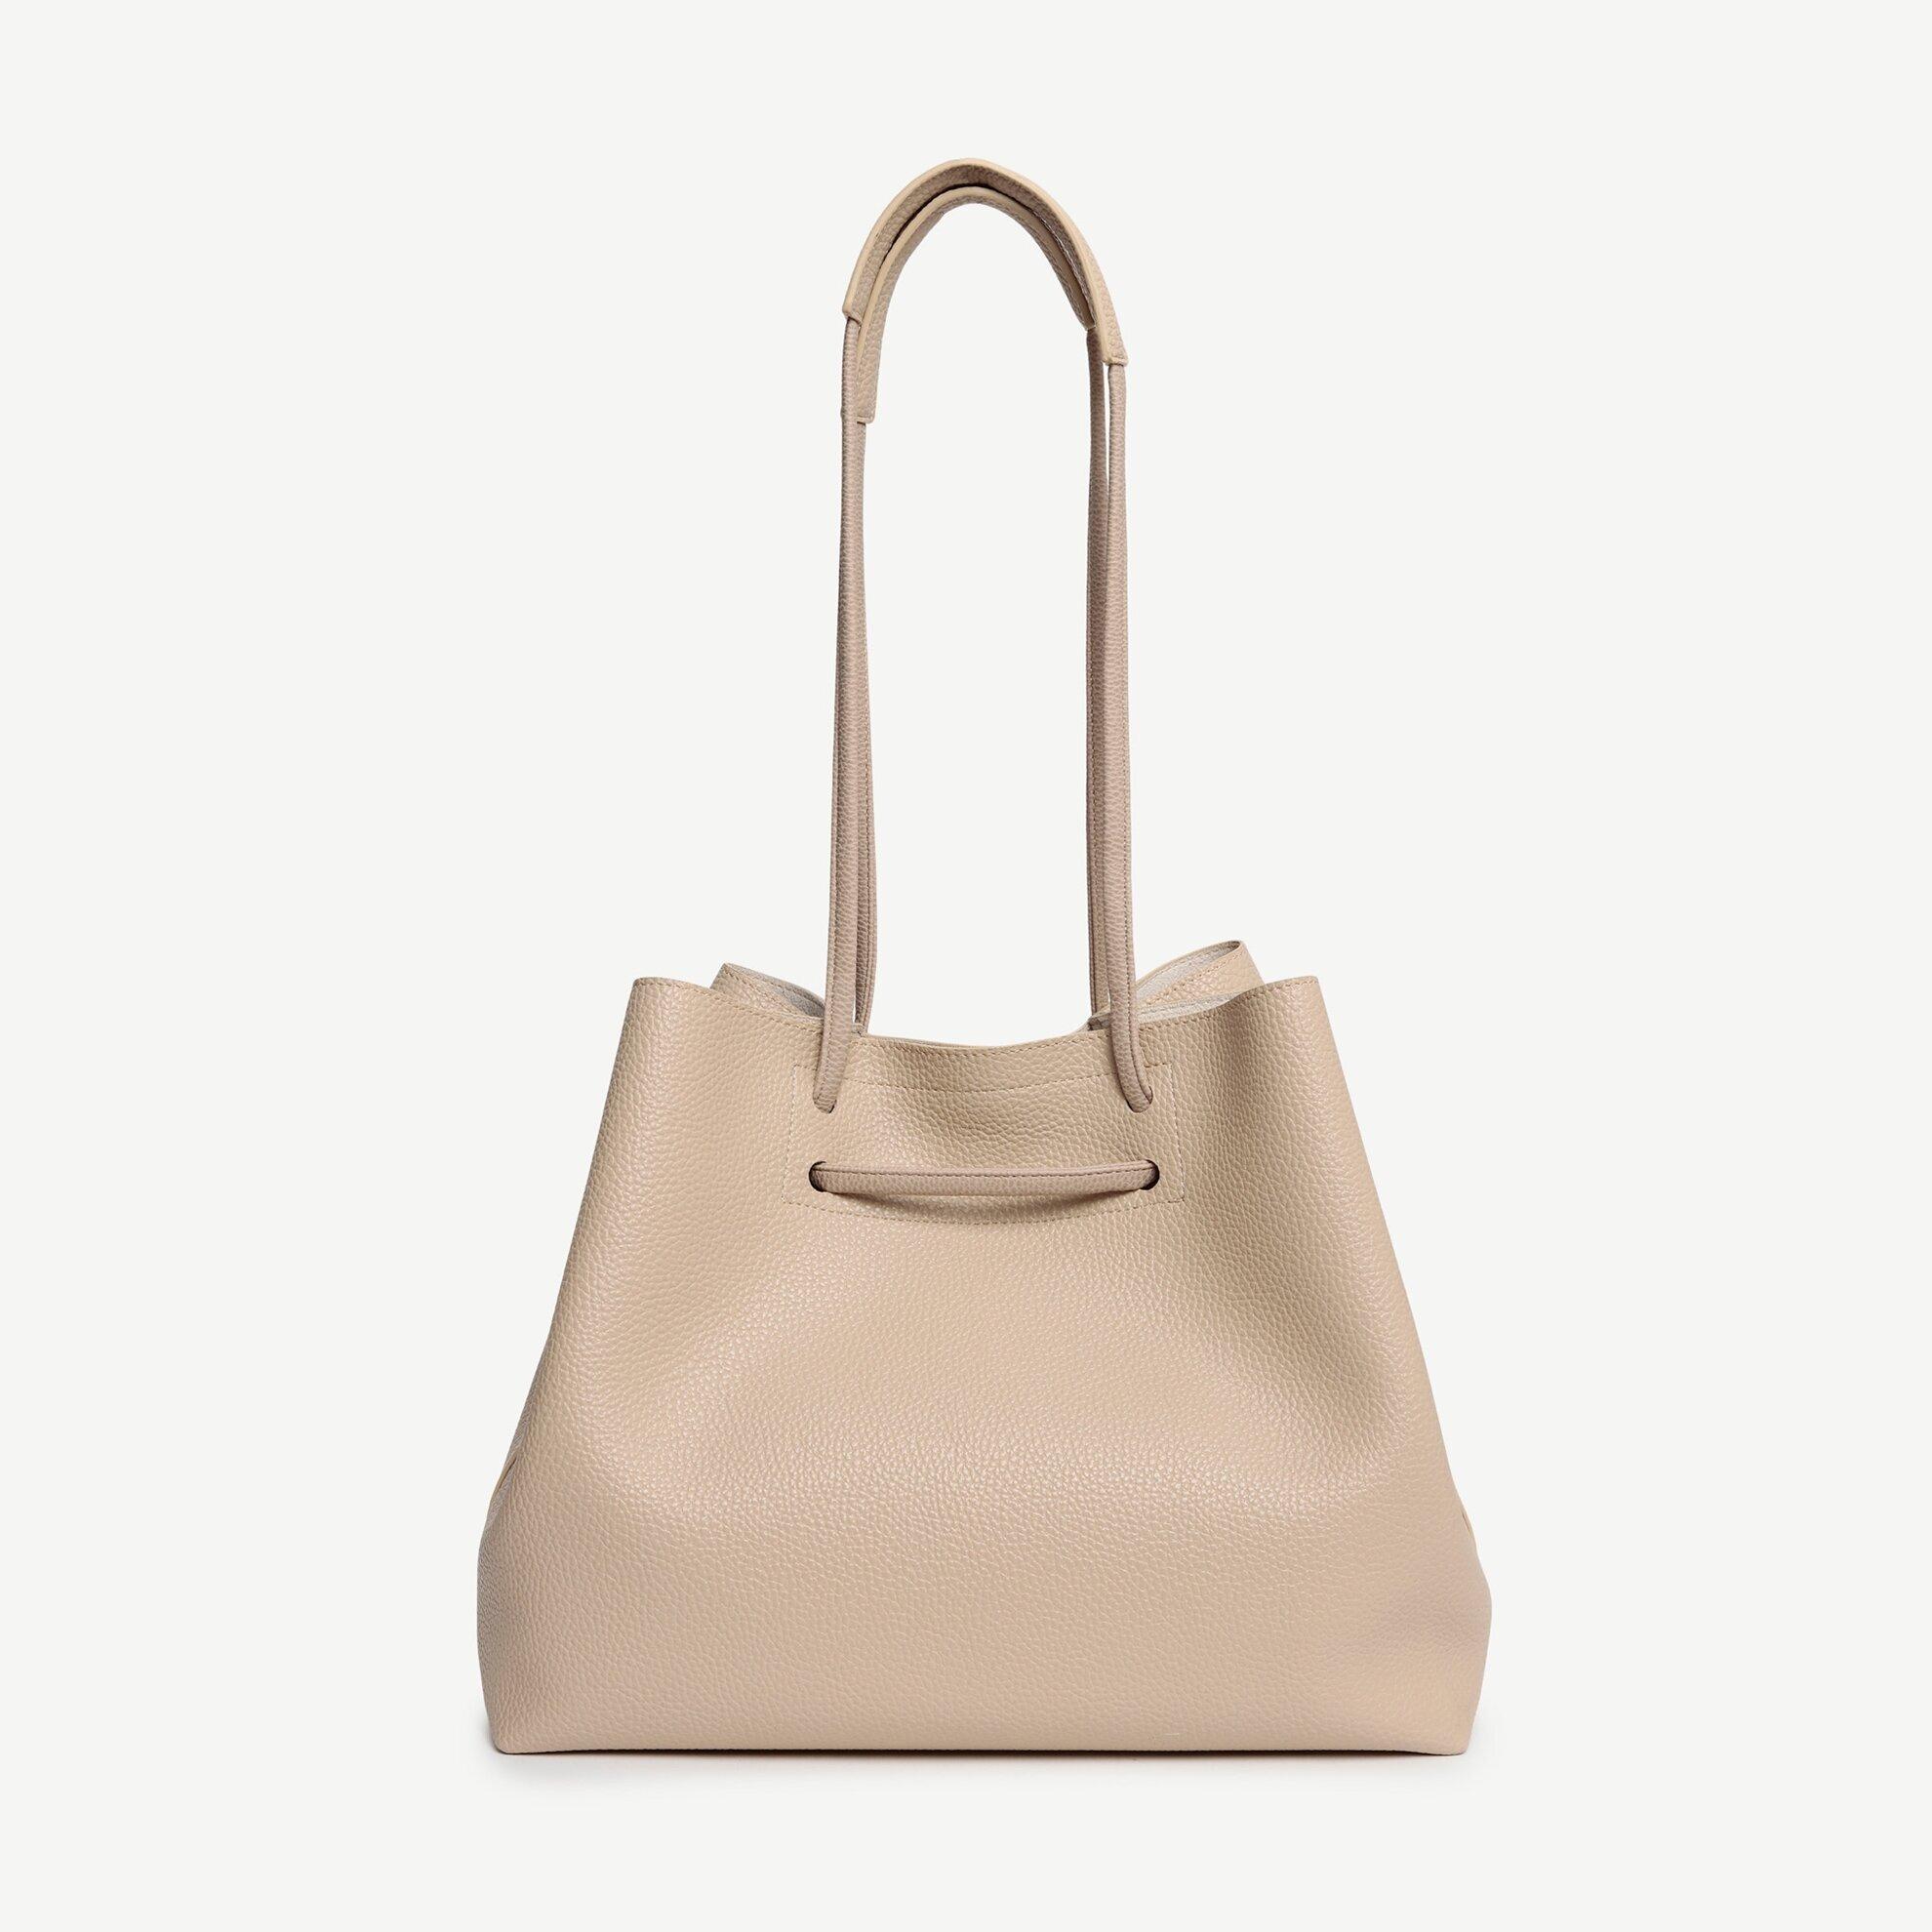 Damen Handtasche groß